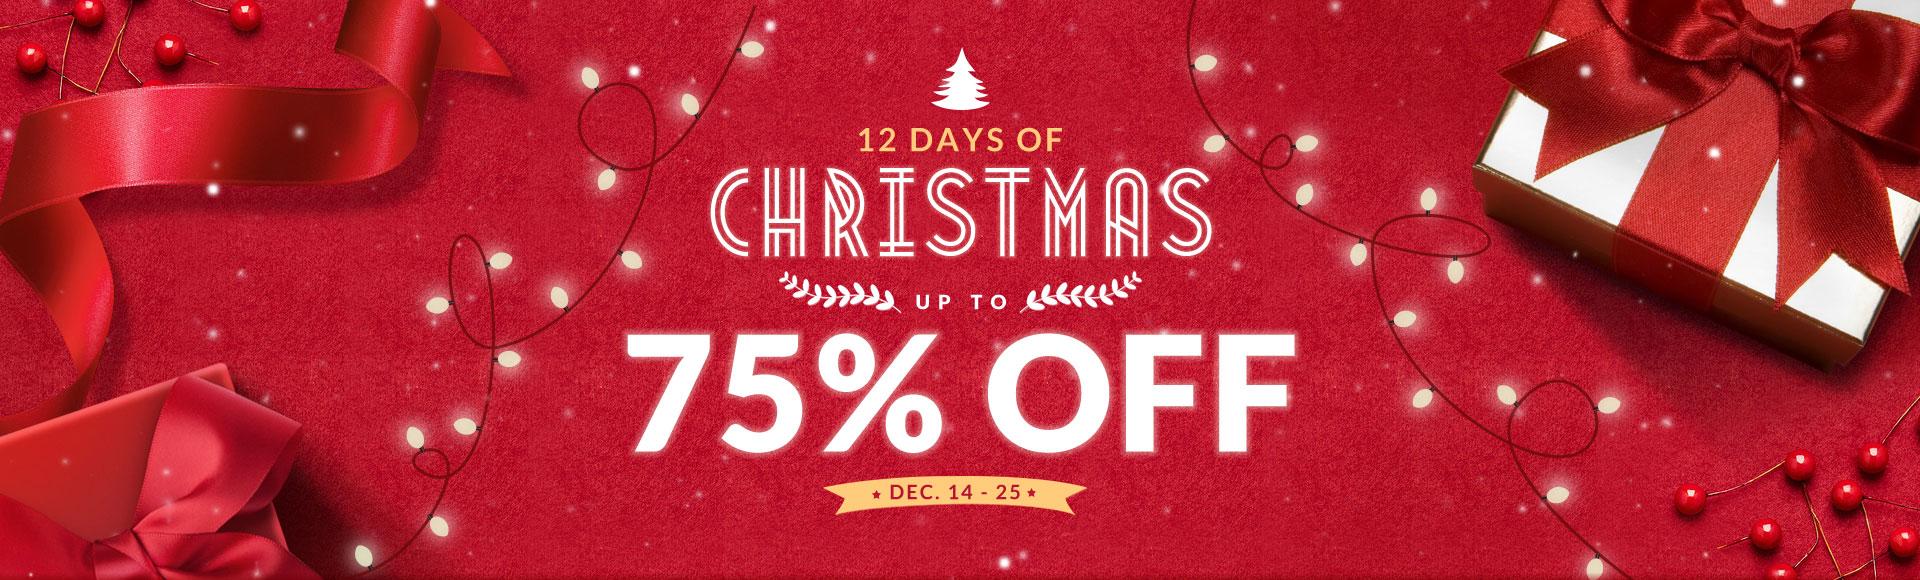 https://css.rglcdn.com/imagecache/RG/special/high_christmas/images/en_banner.jpg